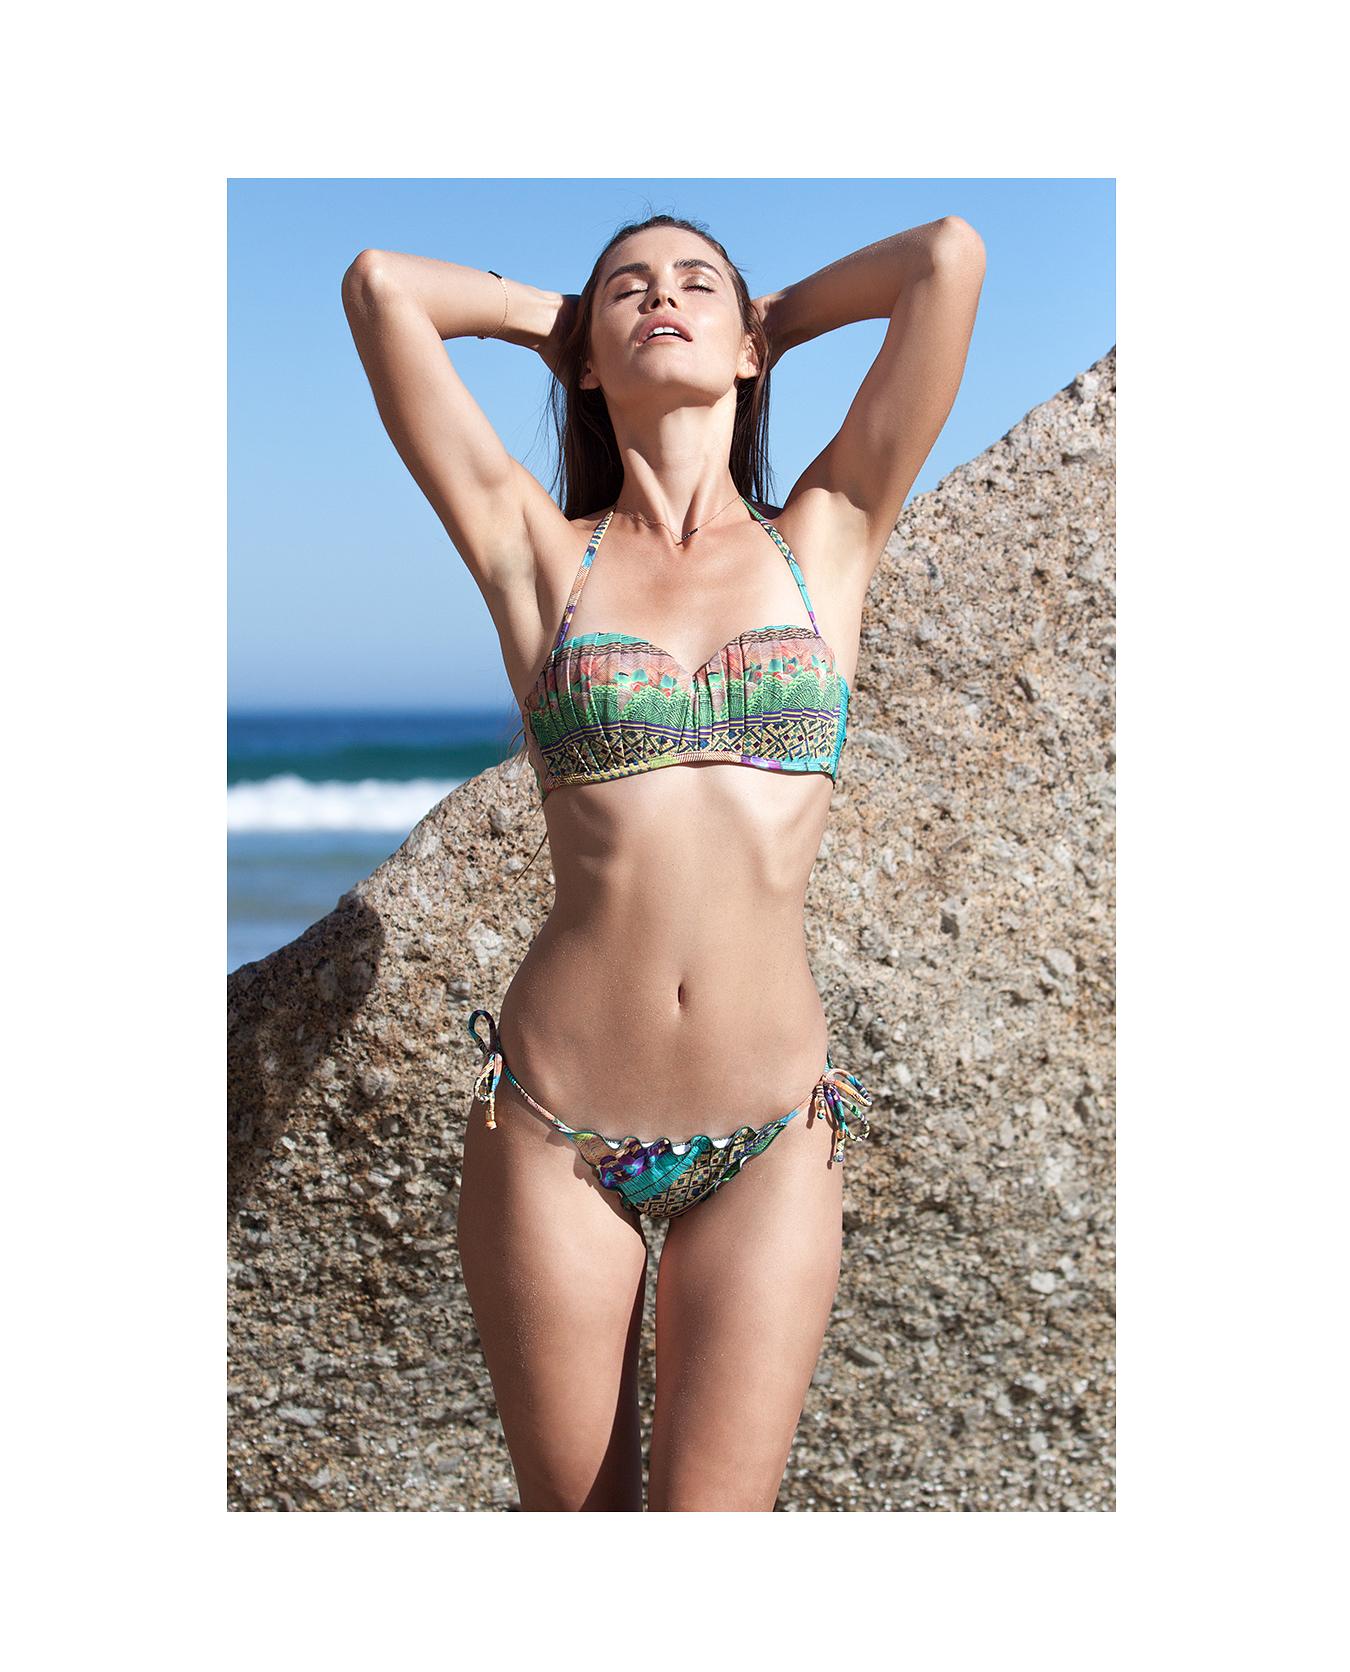 Leaked Marike Wessels nudes (48 photo), Topless, Bikini, Selfie, bra 2019